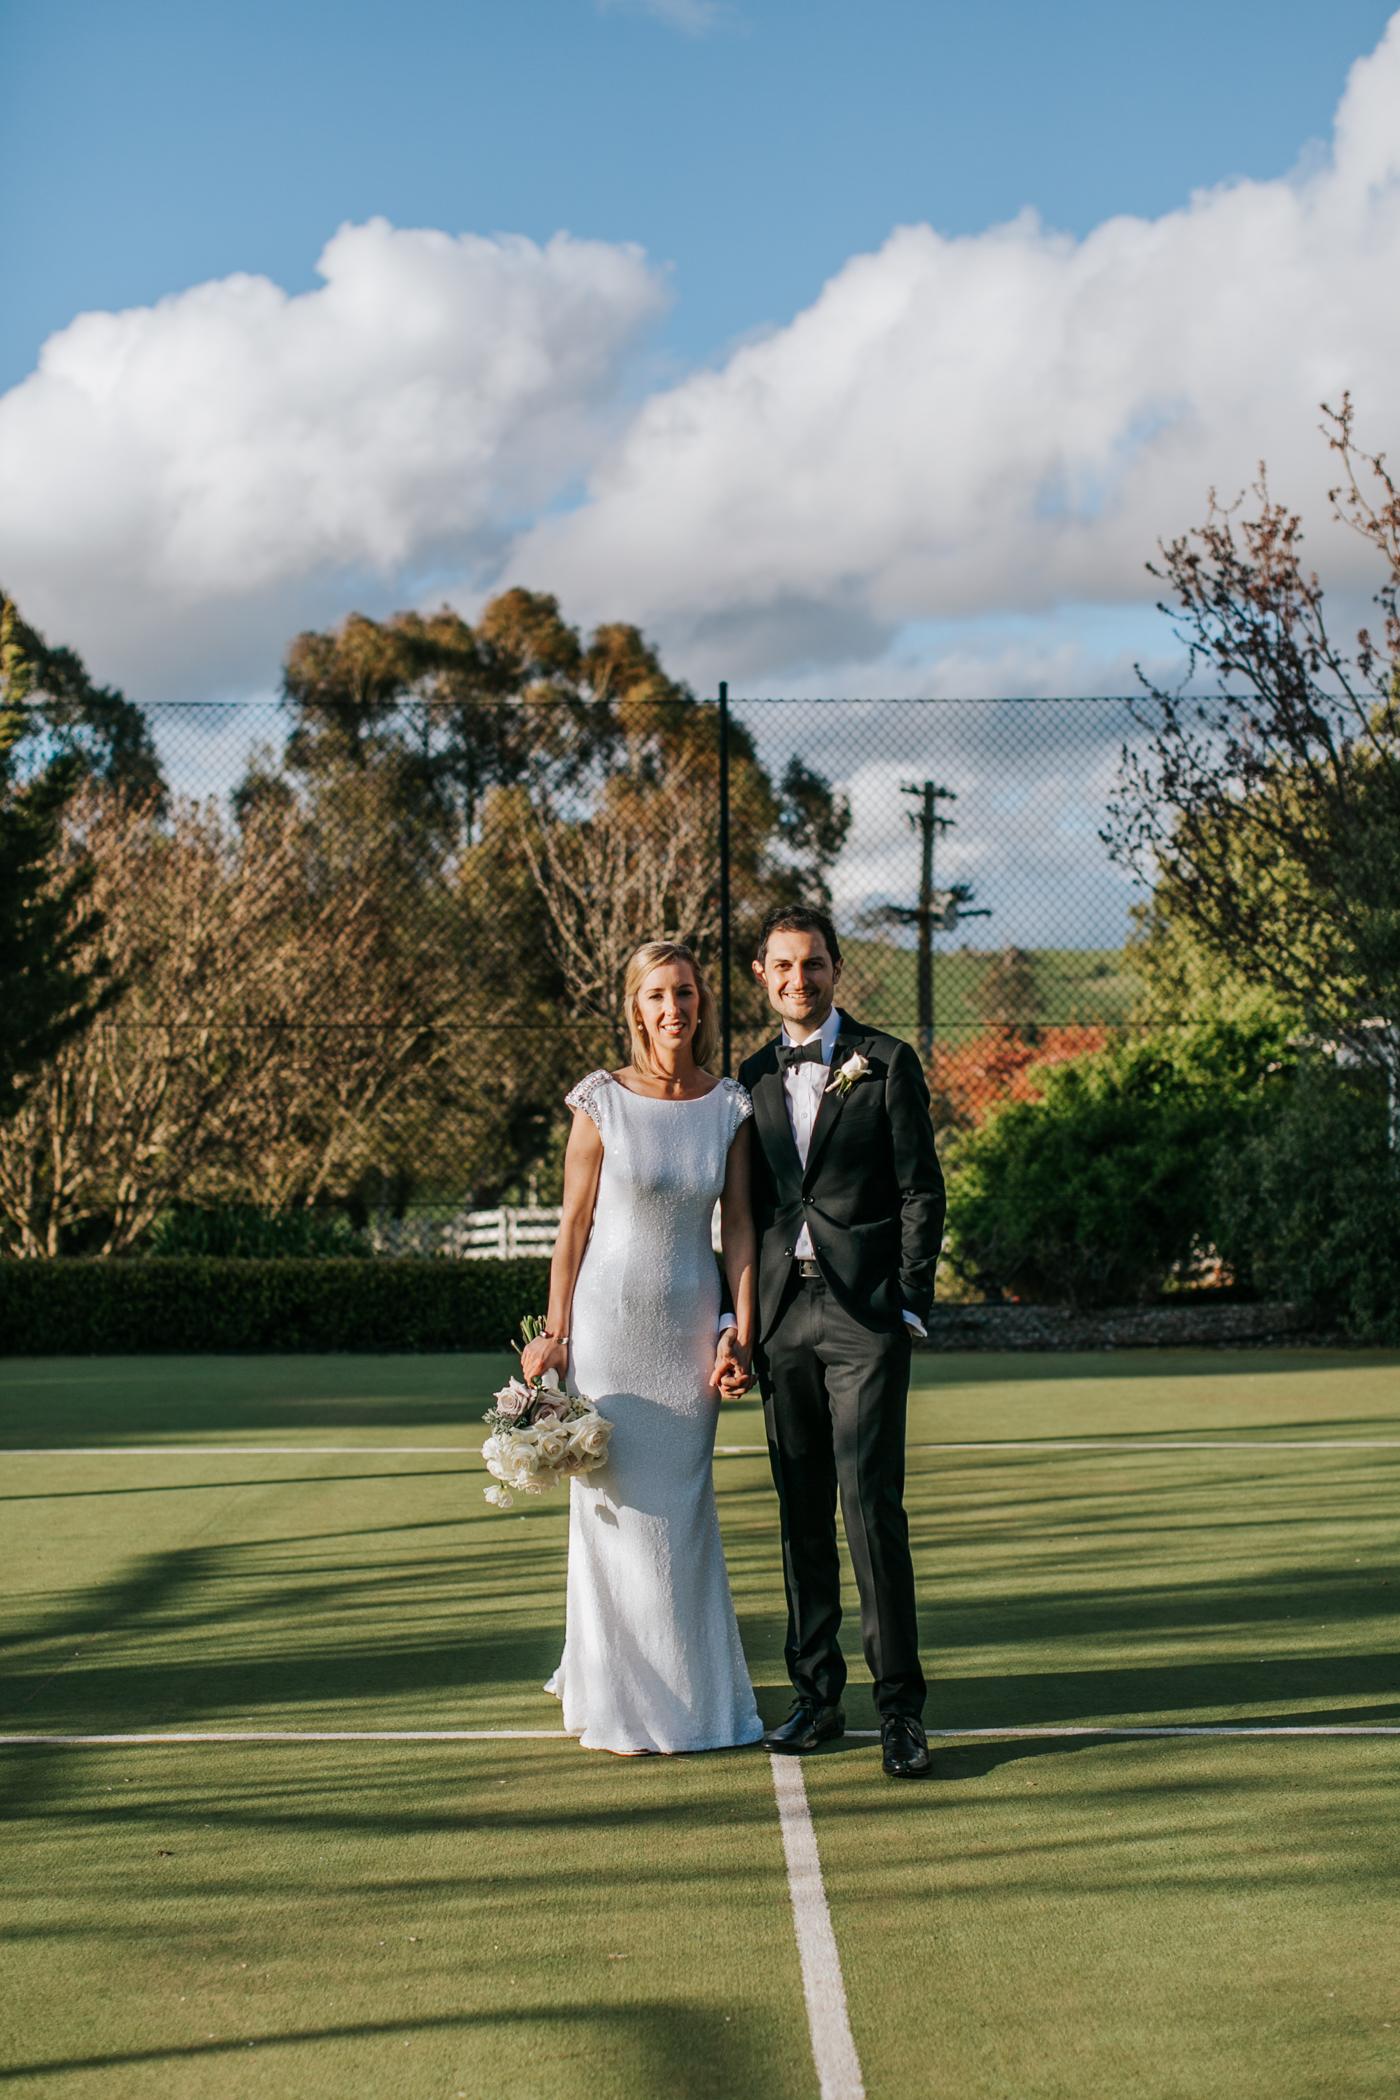 Bridget & James - Orange Country Wedding - Samantha Heather Photography-127.jpg